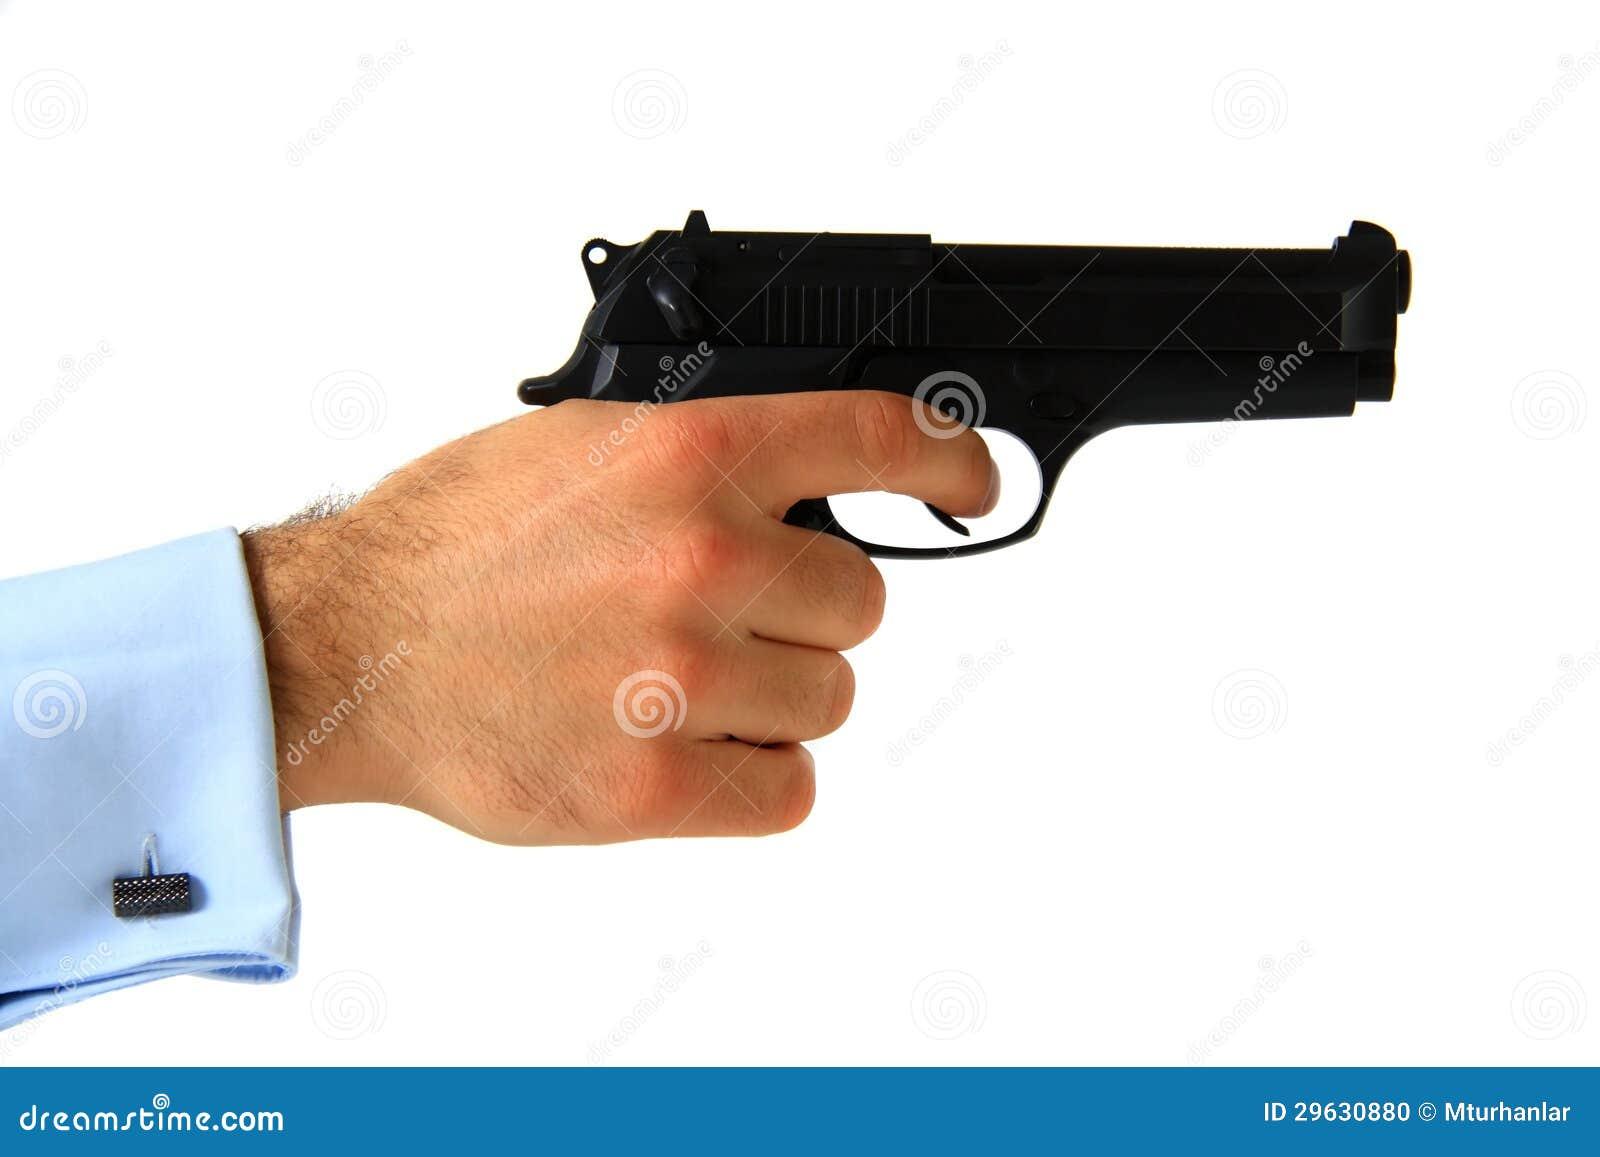 Business Man Holding Pistol Stock Photo - Image: 29630880